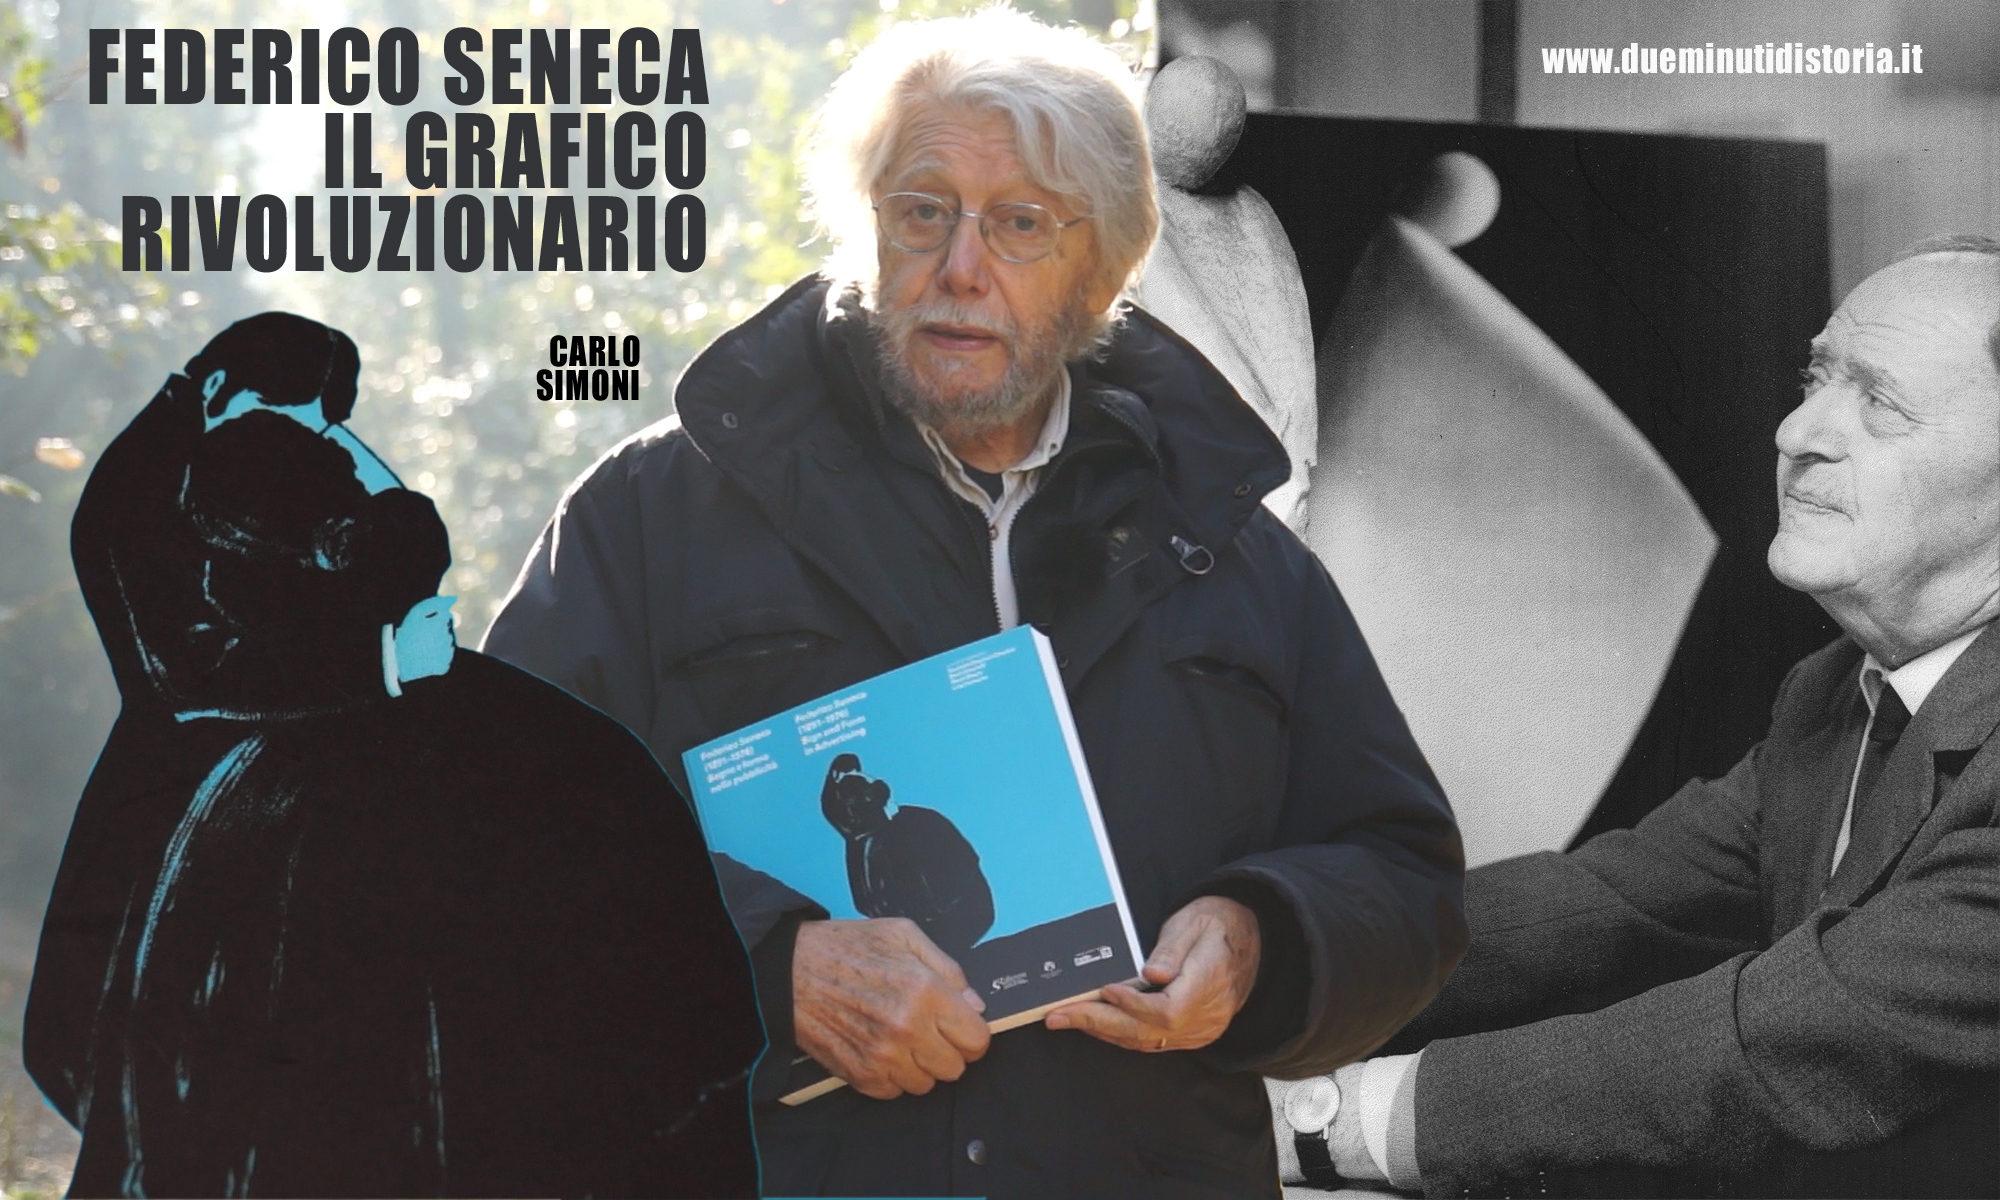 Federico Seneca, il grafico rivoluzionario